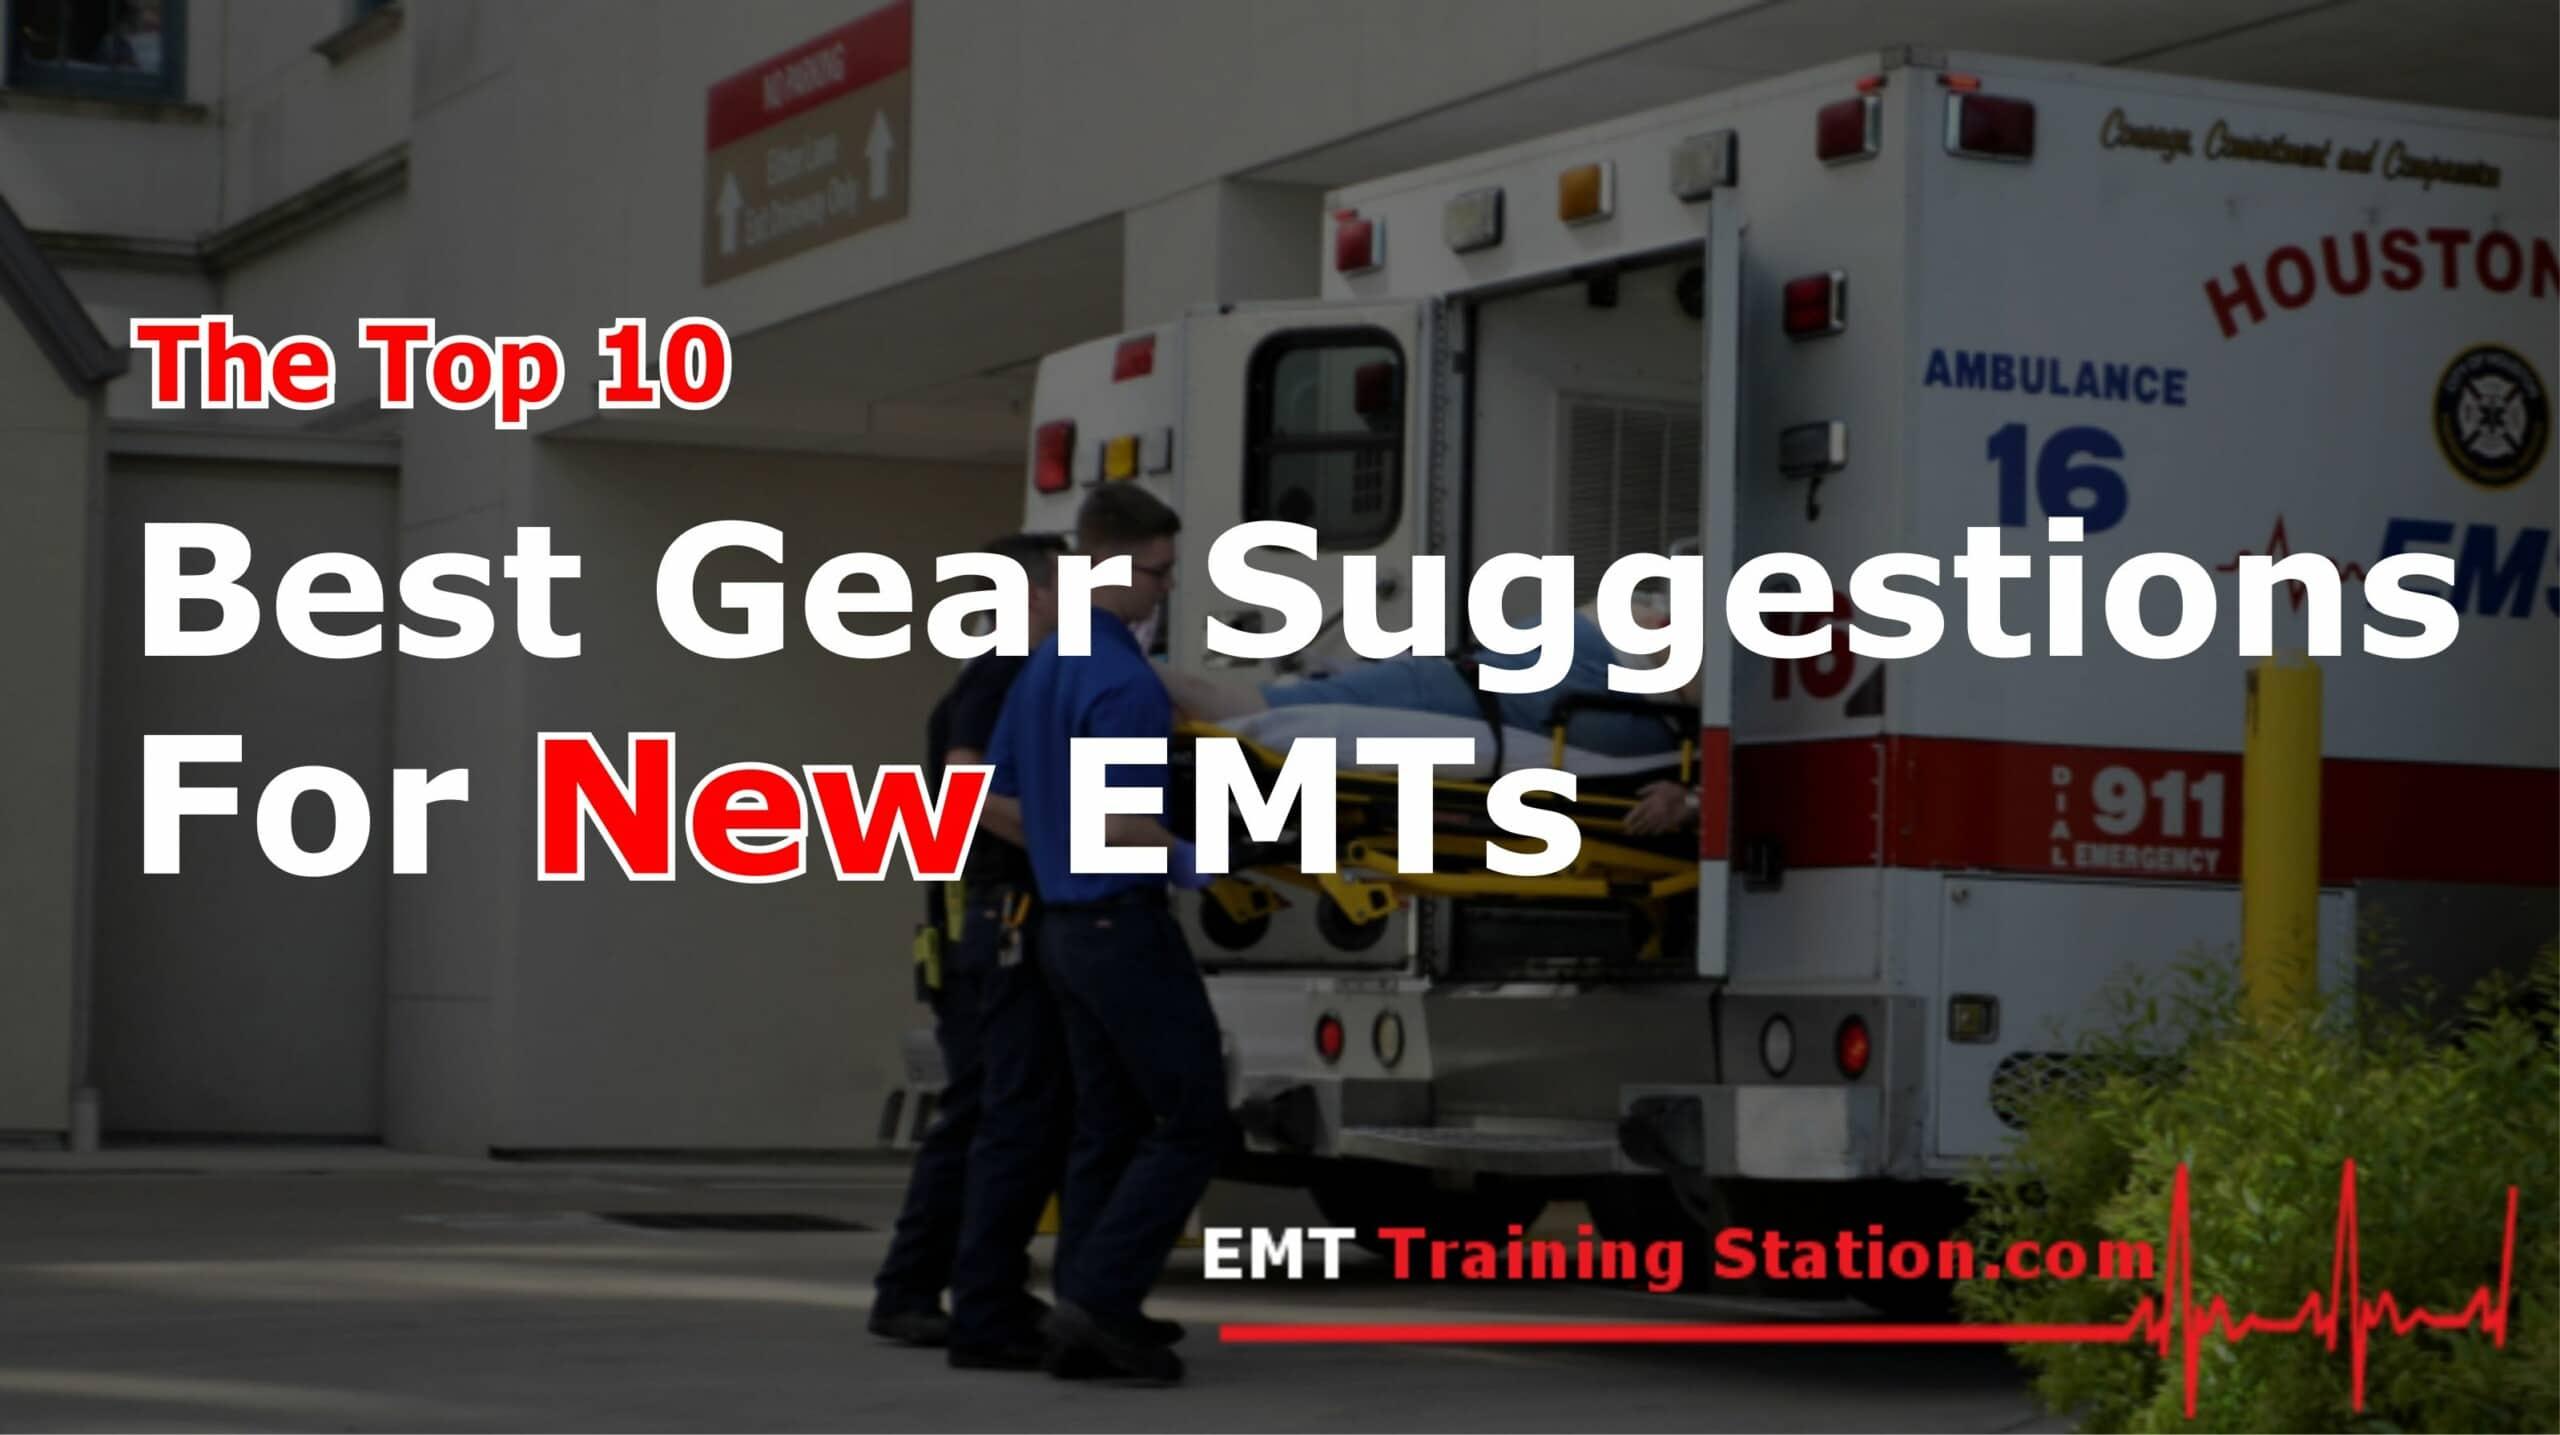 Emt Training Station Emt Training Tips And Information A Path